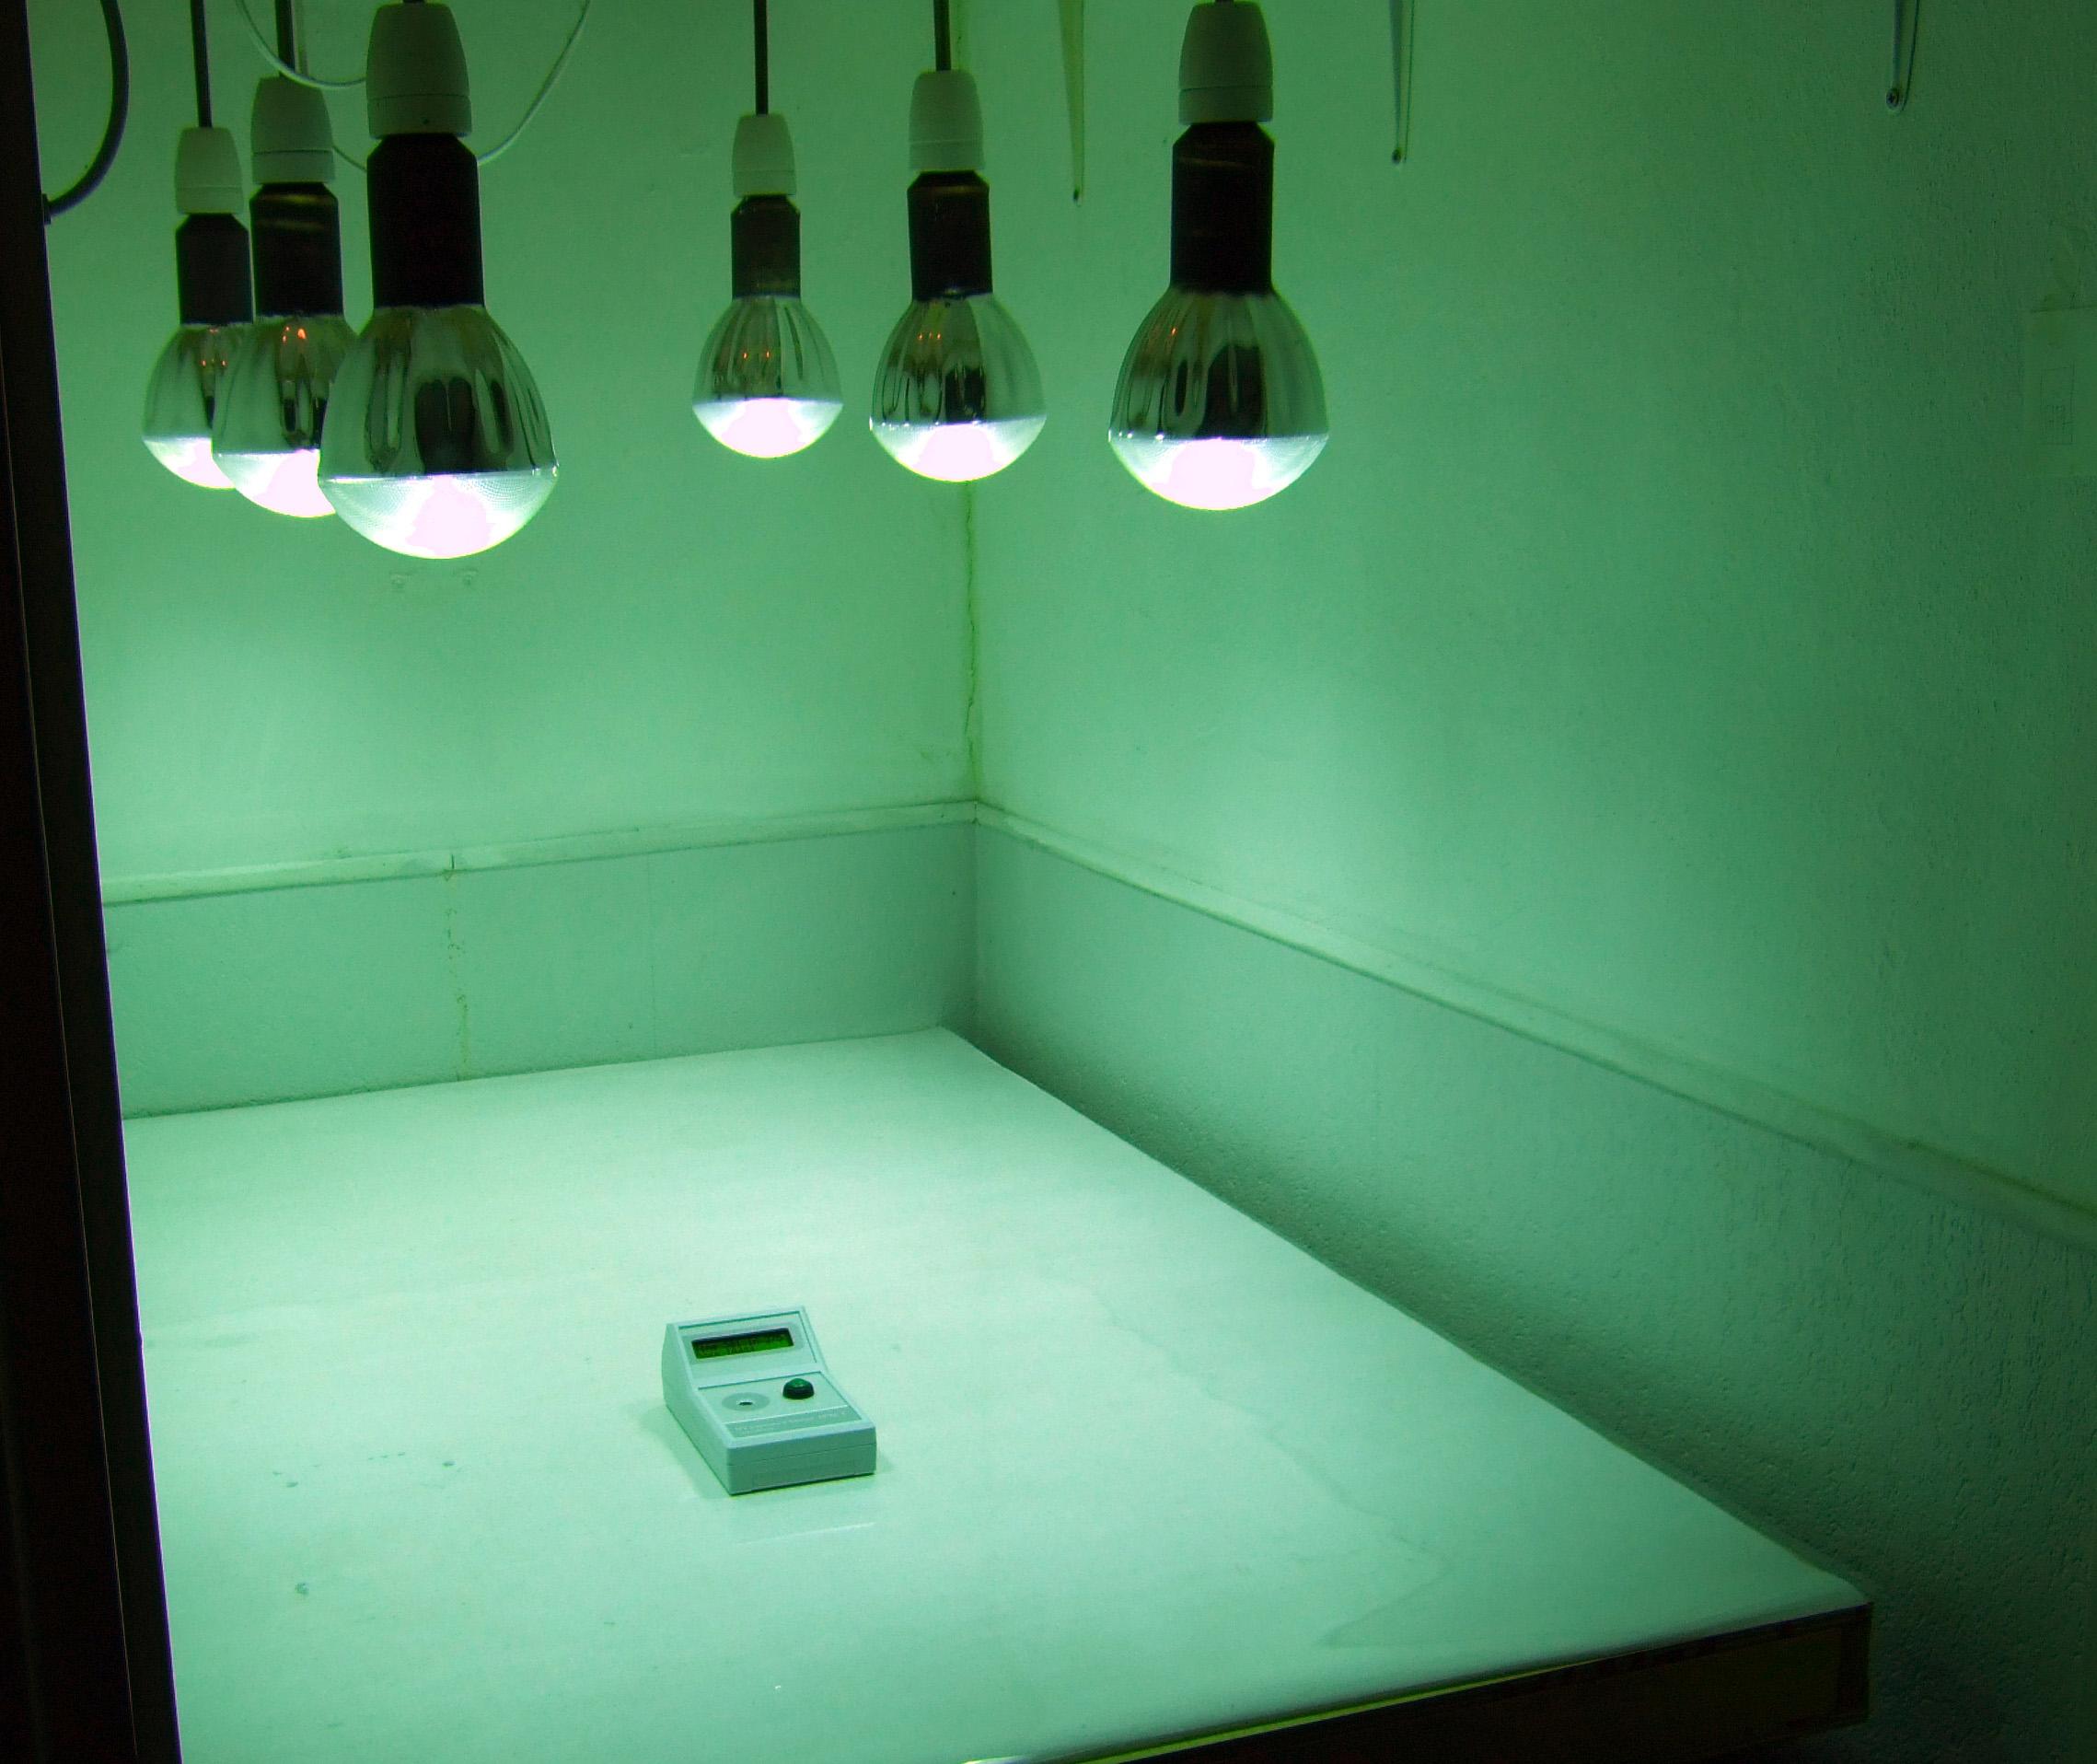 PPM-1 used for testing uniformity of UV source - courtesy of   Kees Brandenburg  , Netherlands